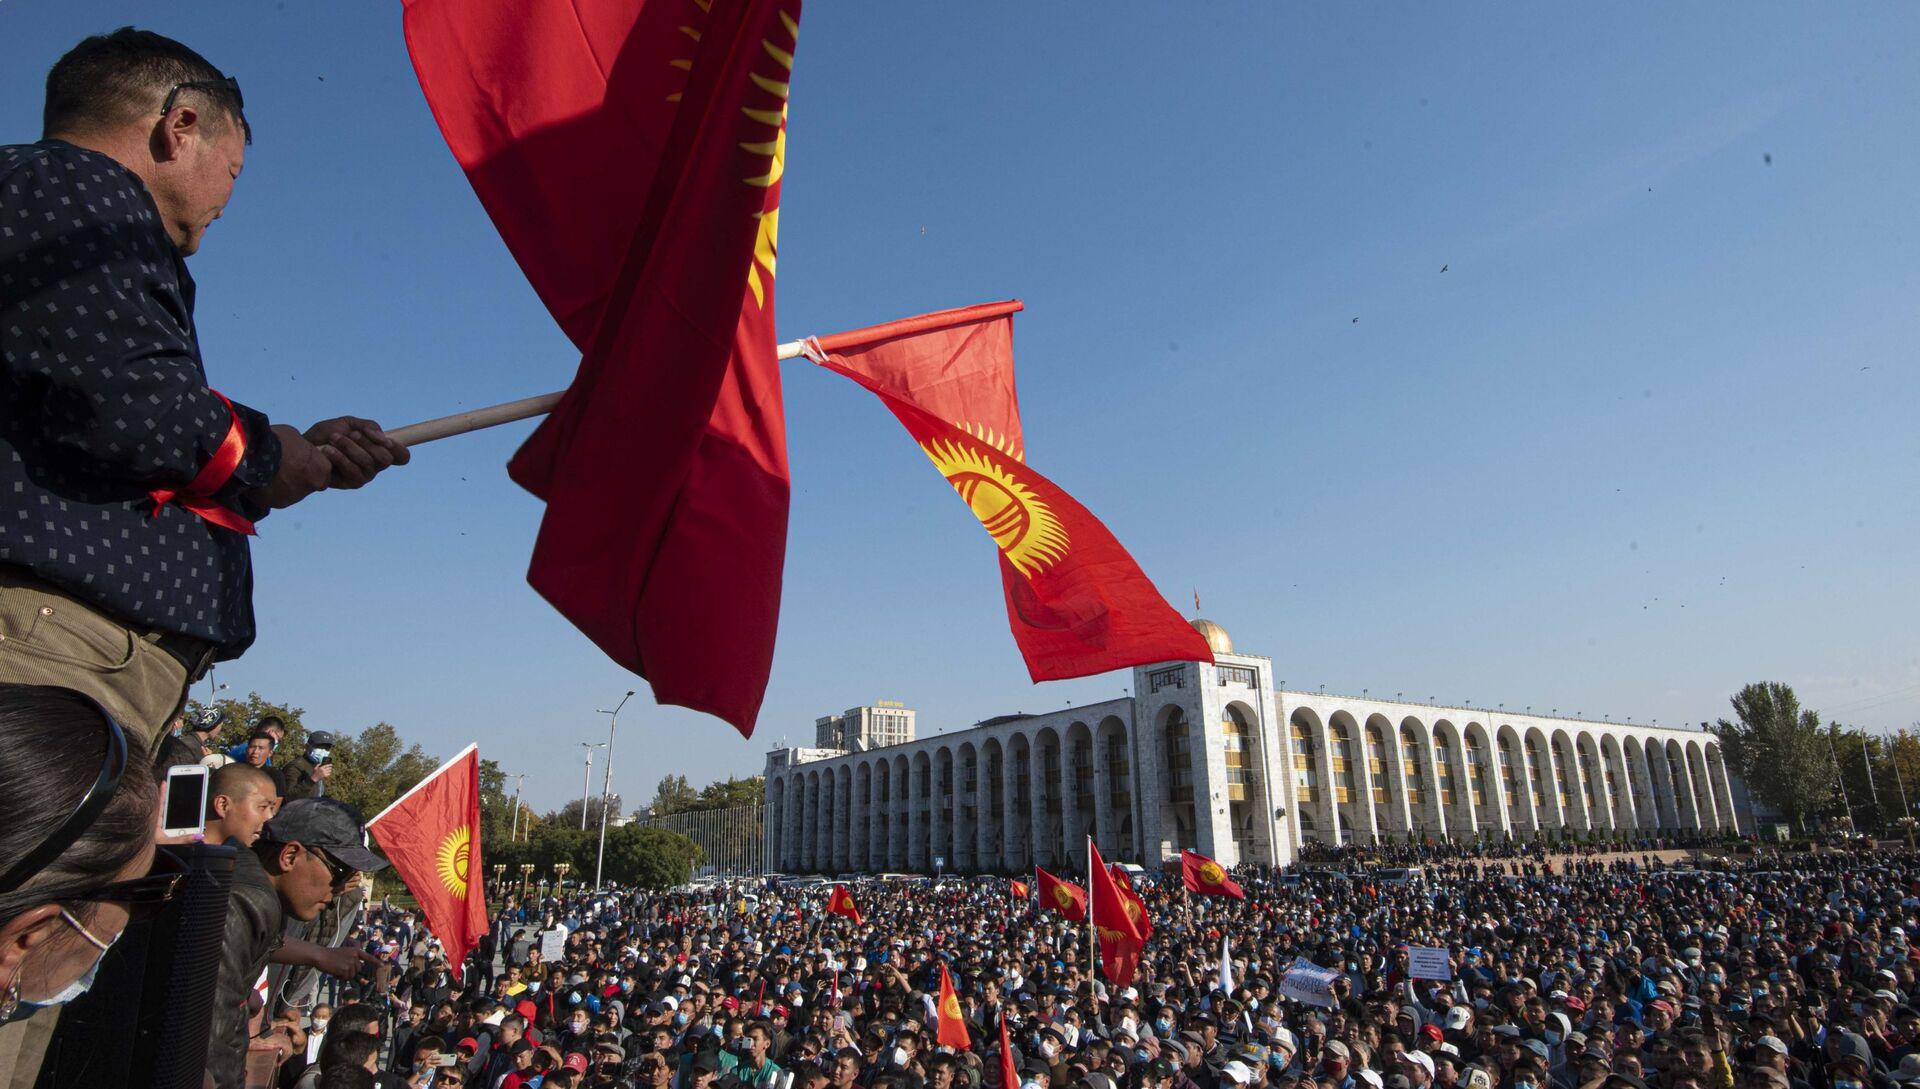 Kyrgyzstan Parliamentary Elections Protest - РИА Новости, 1920, 06.10.2020